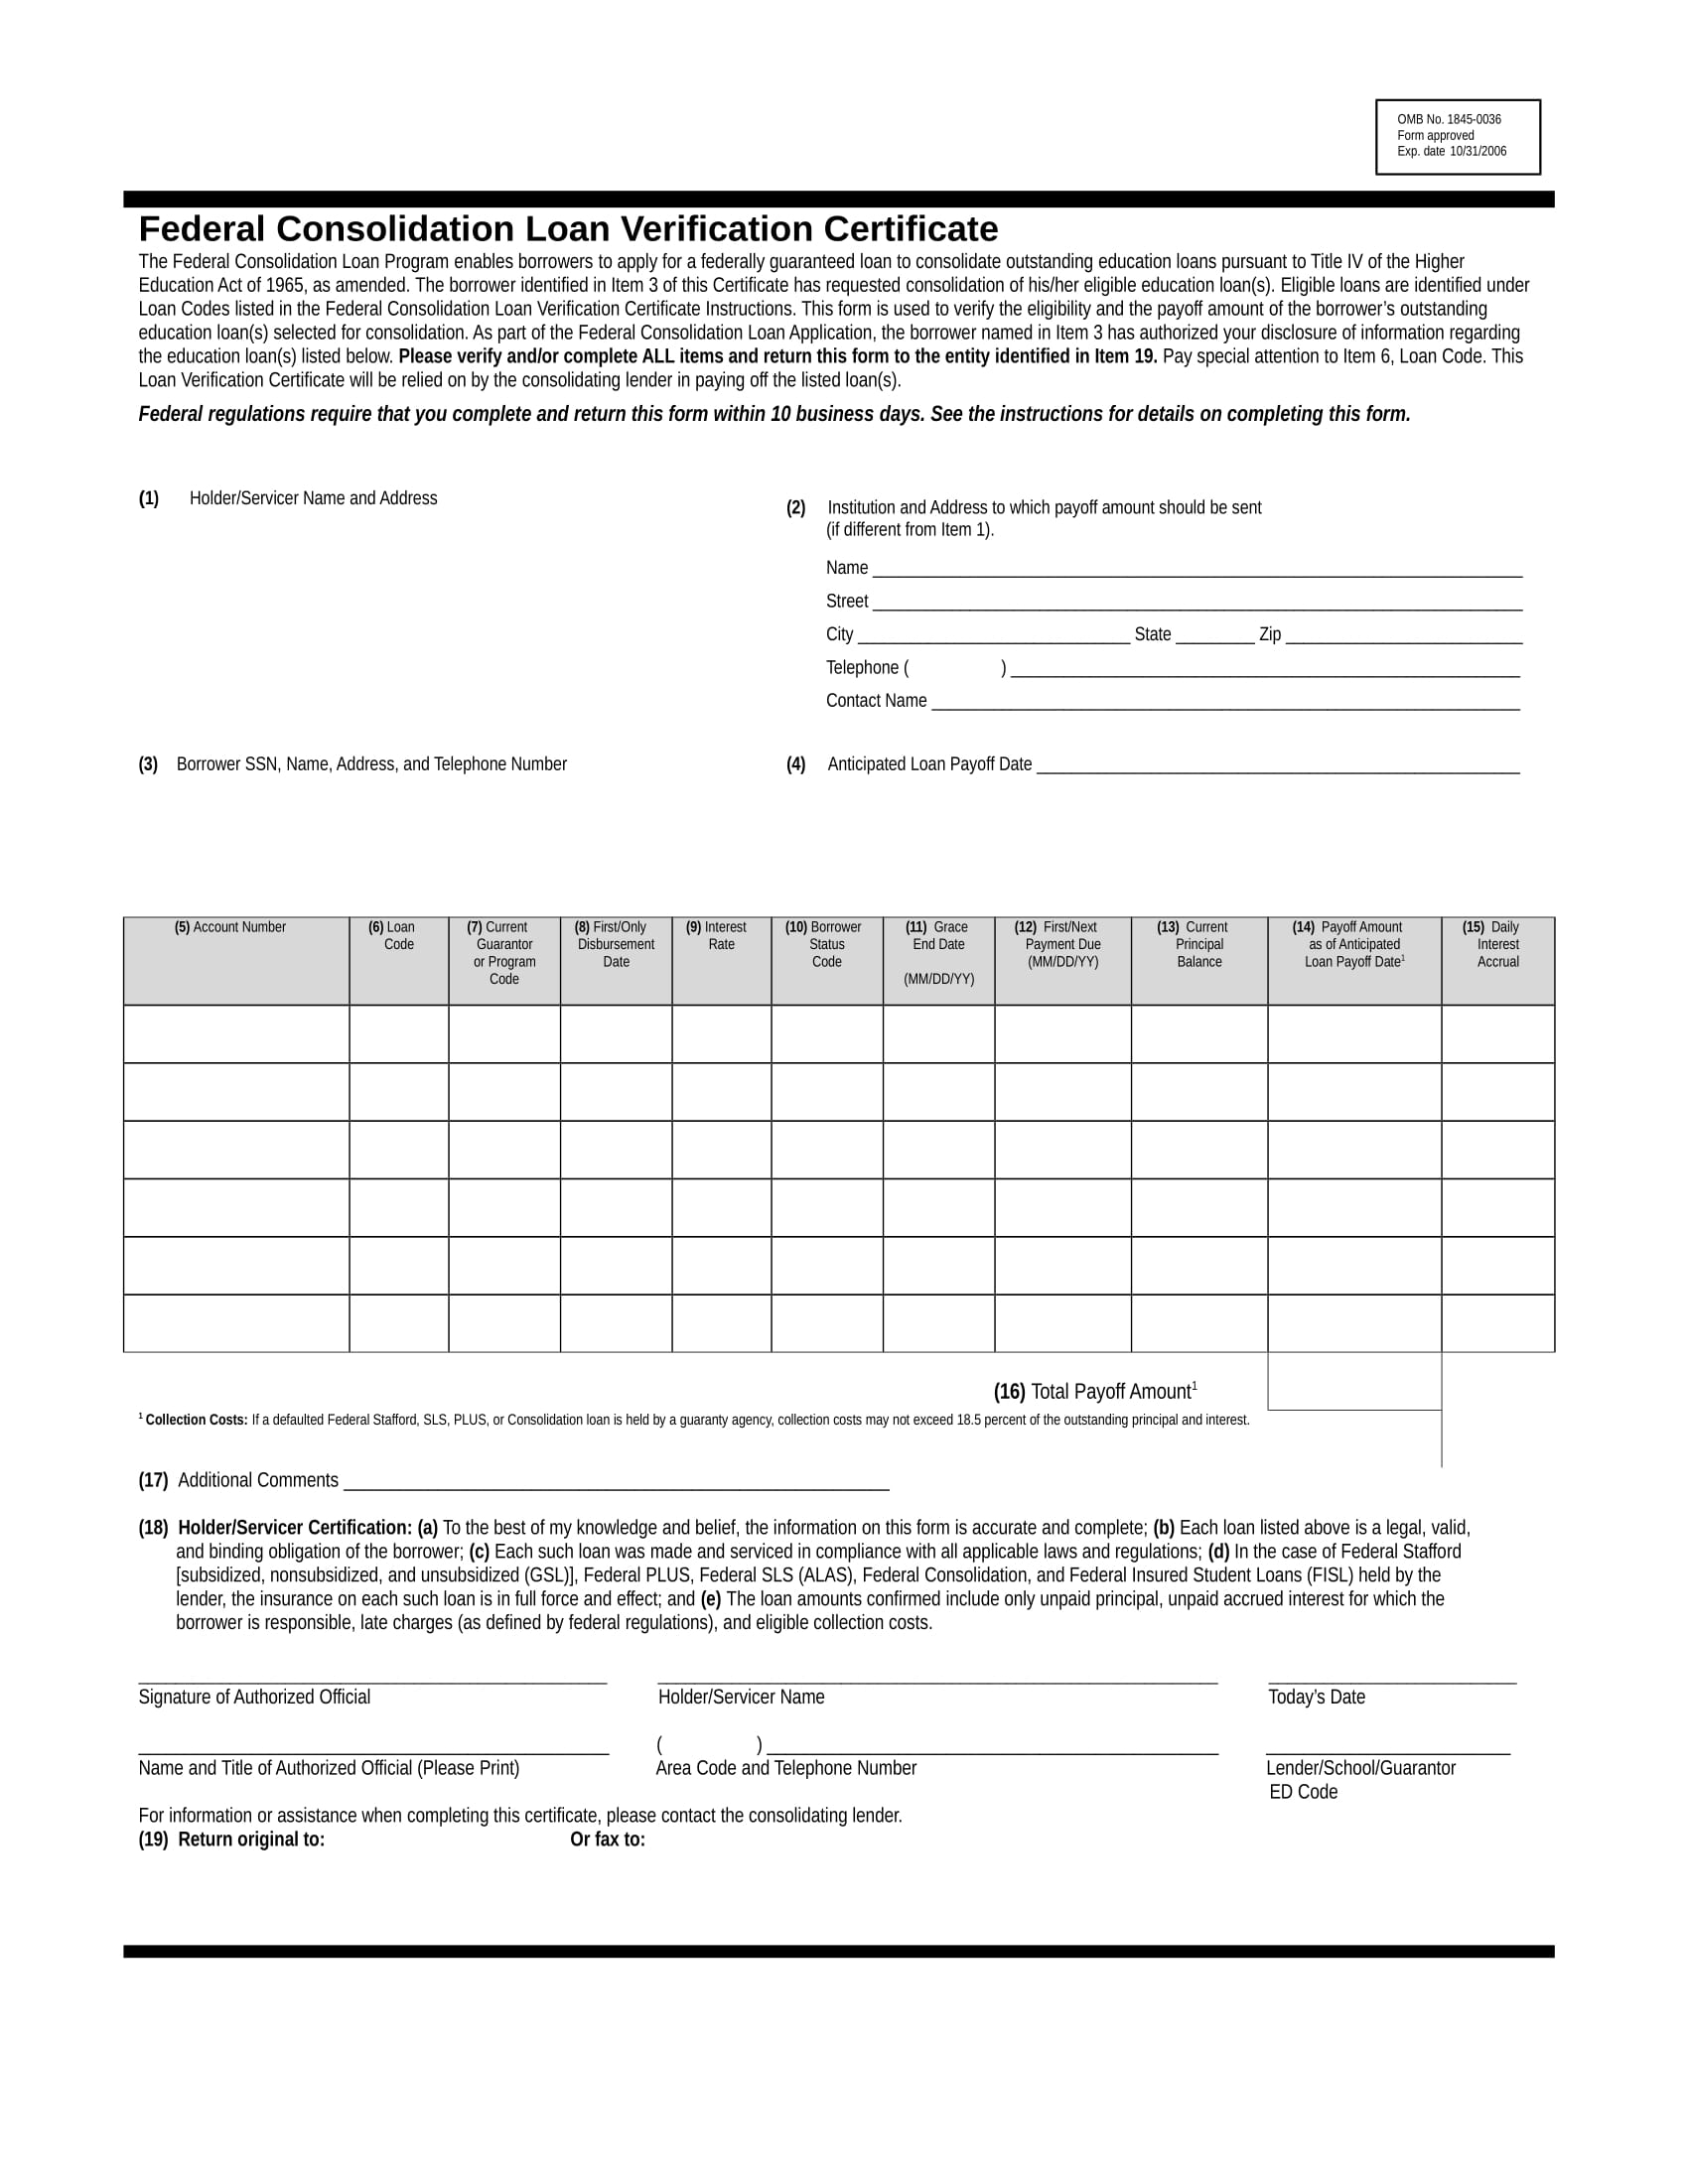 loan verification certificate form 1